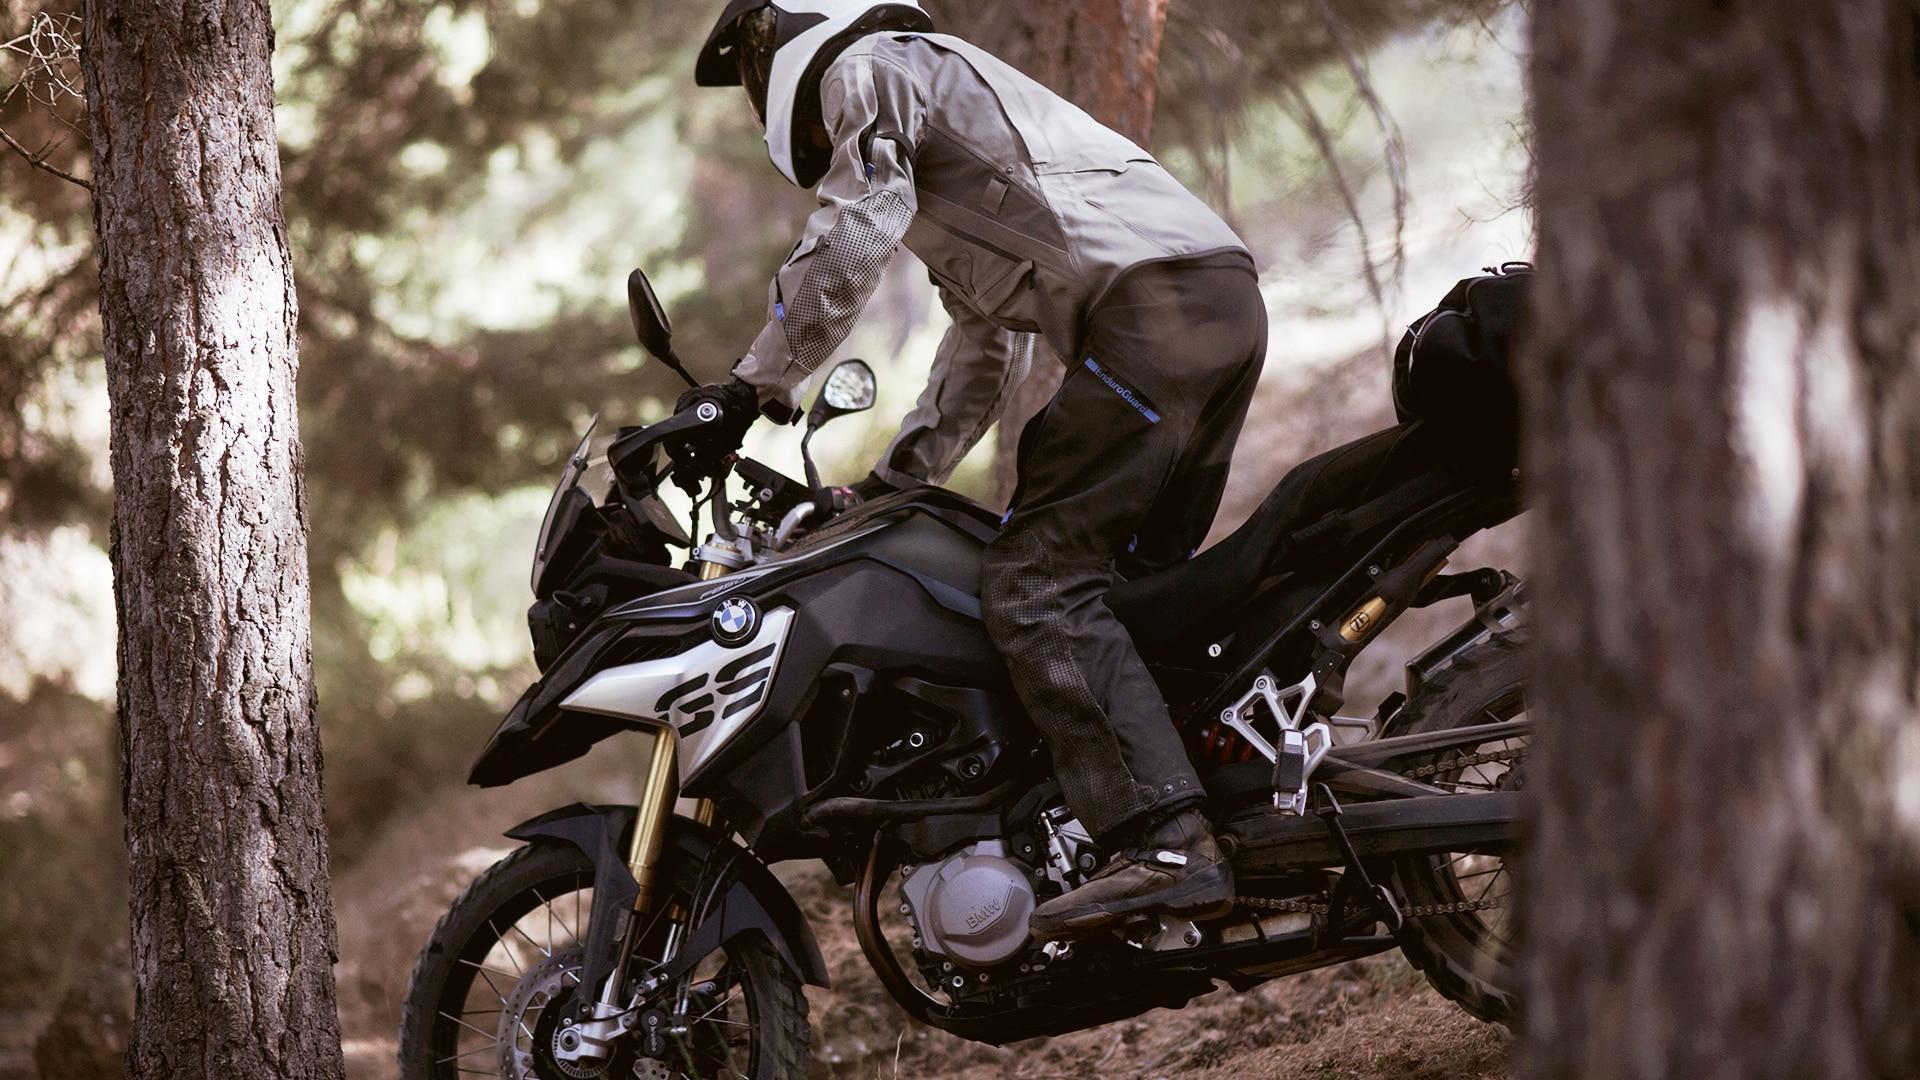 Home | BMW Motorrad